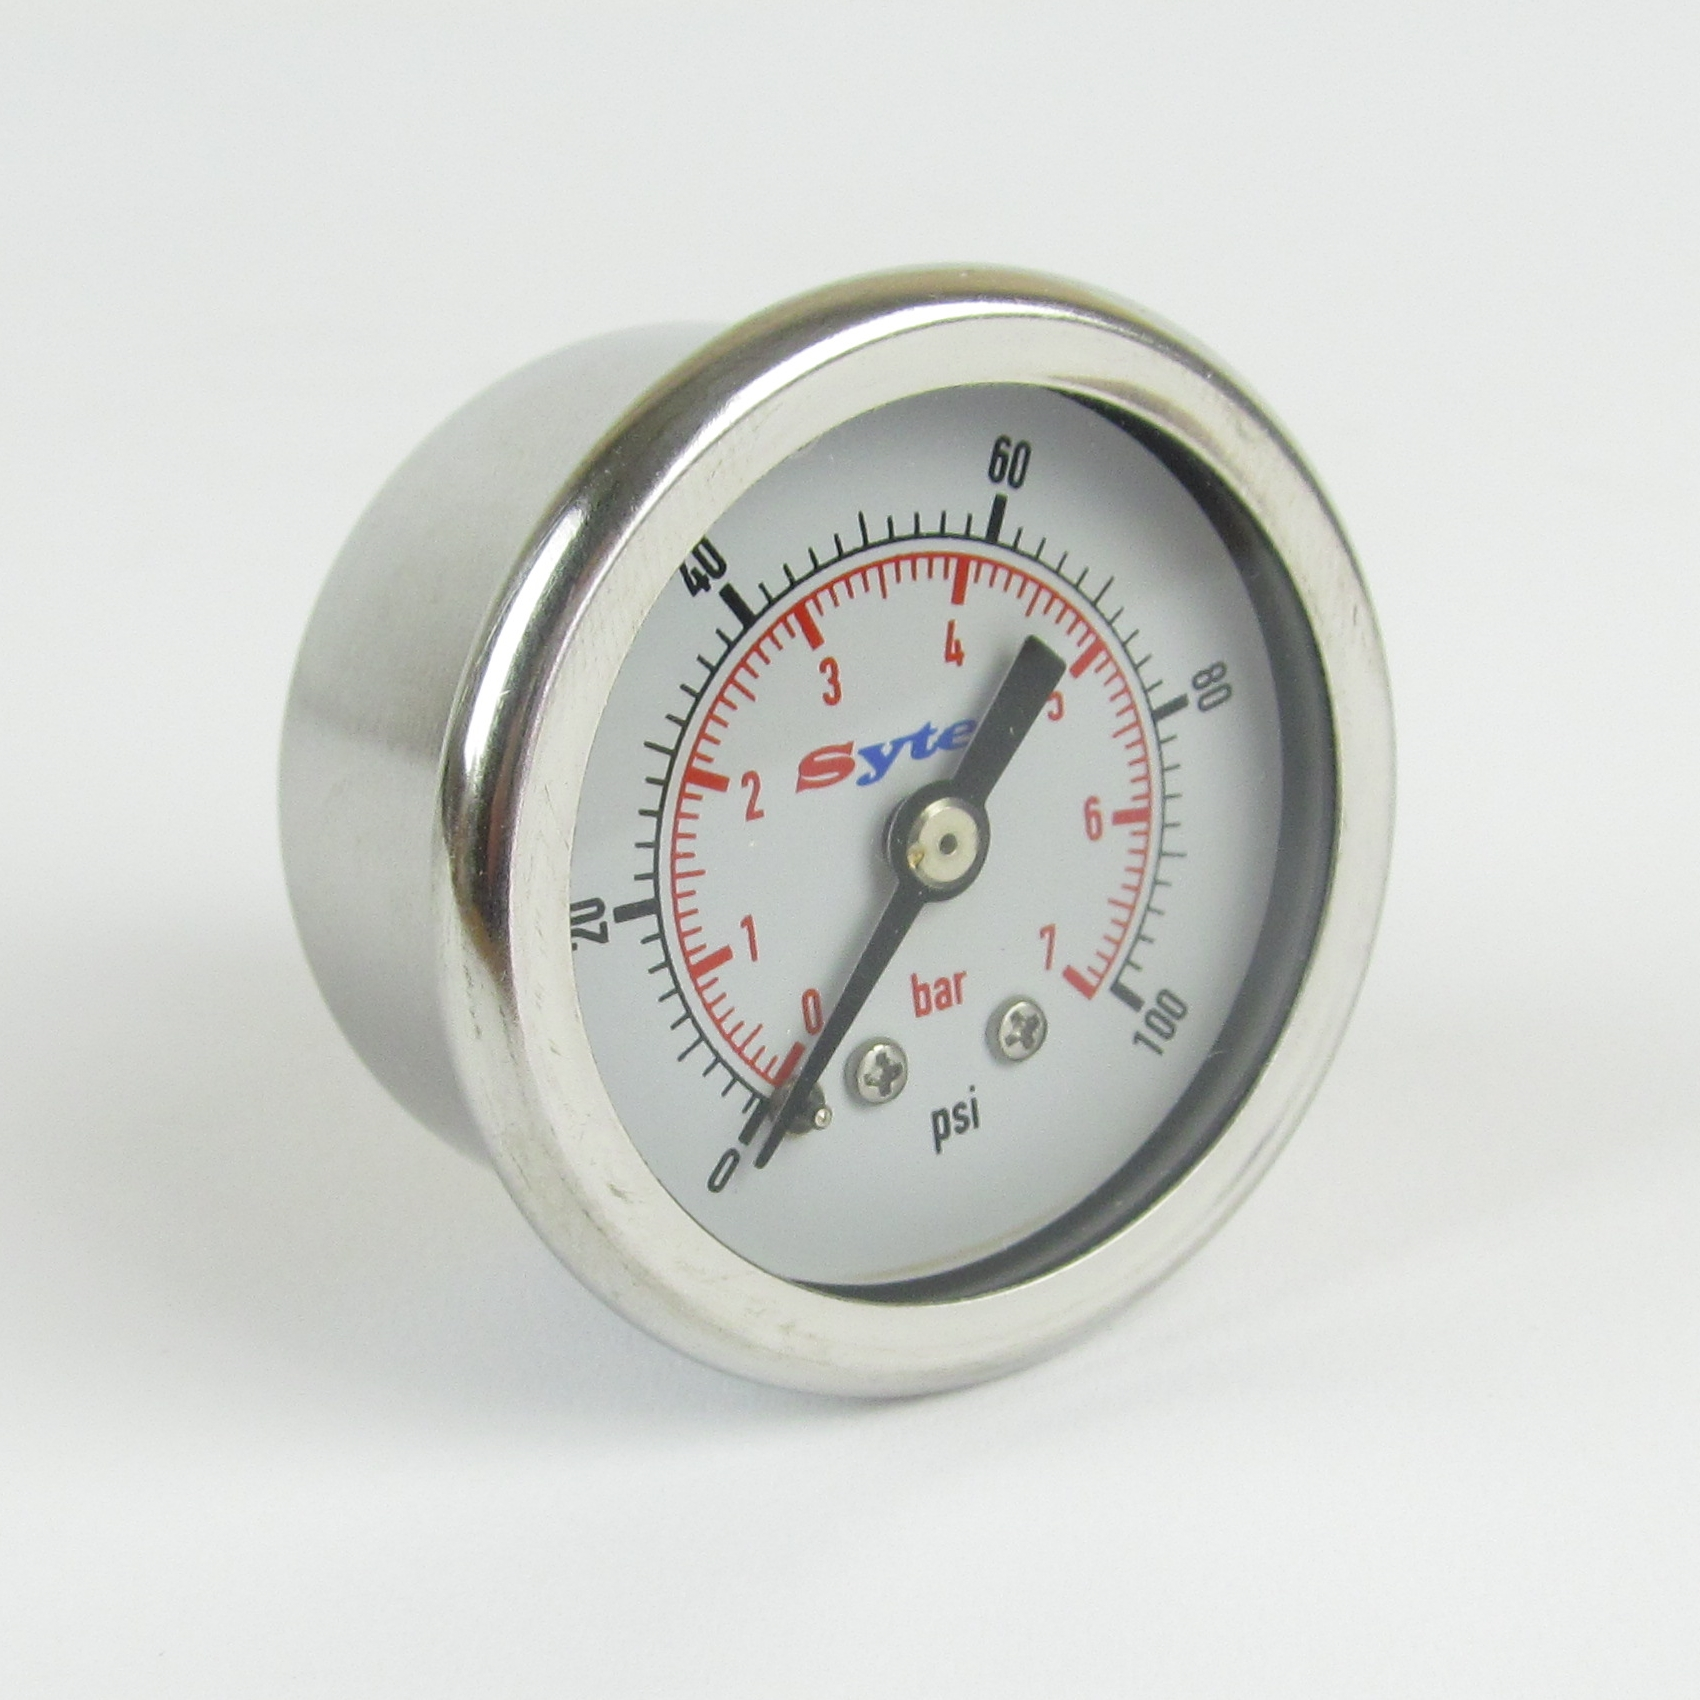 Fuel pressure gauge psi eurocarb